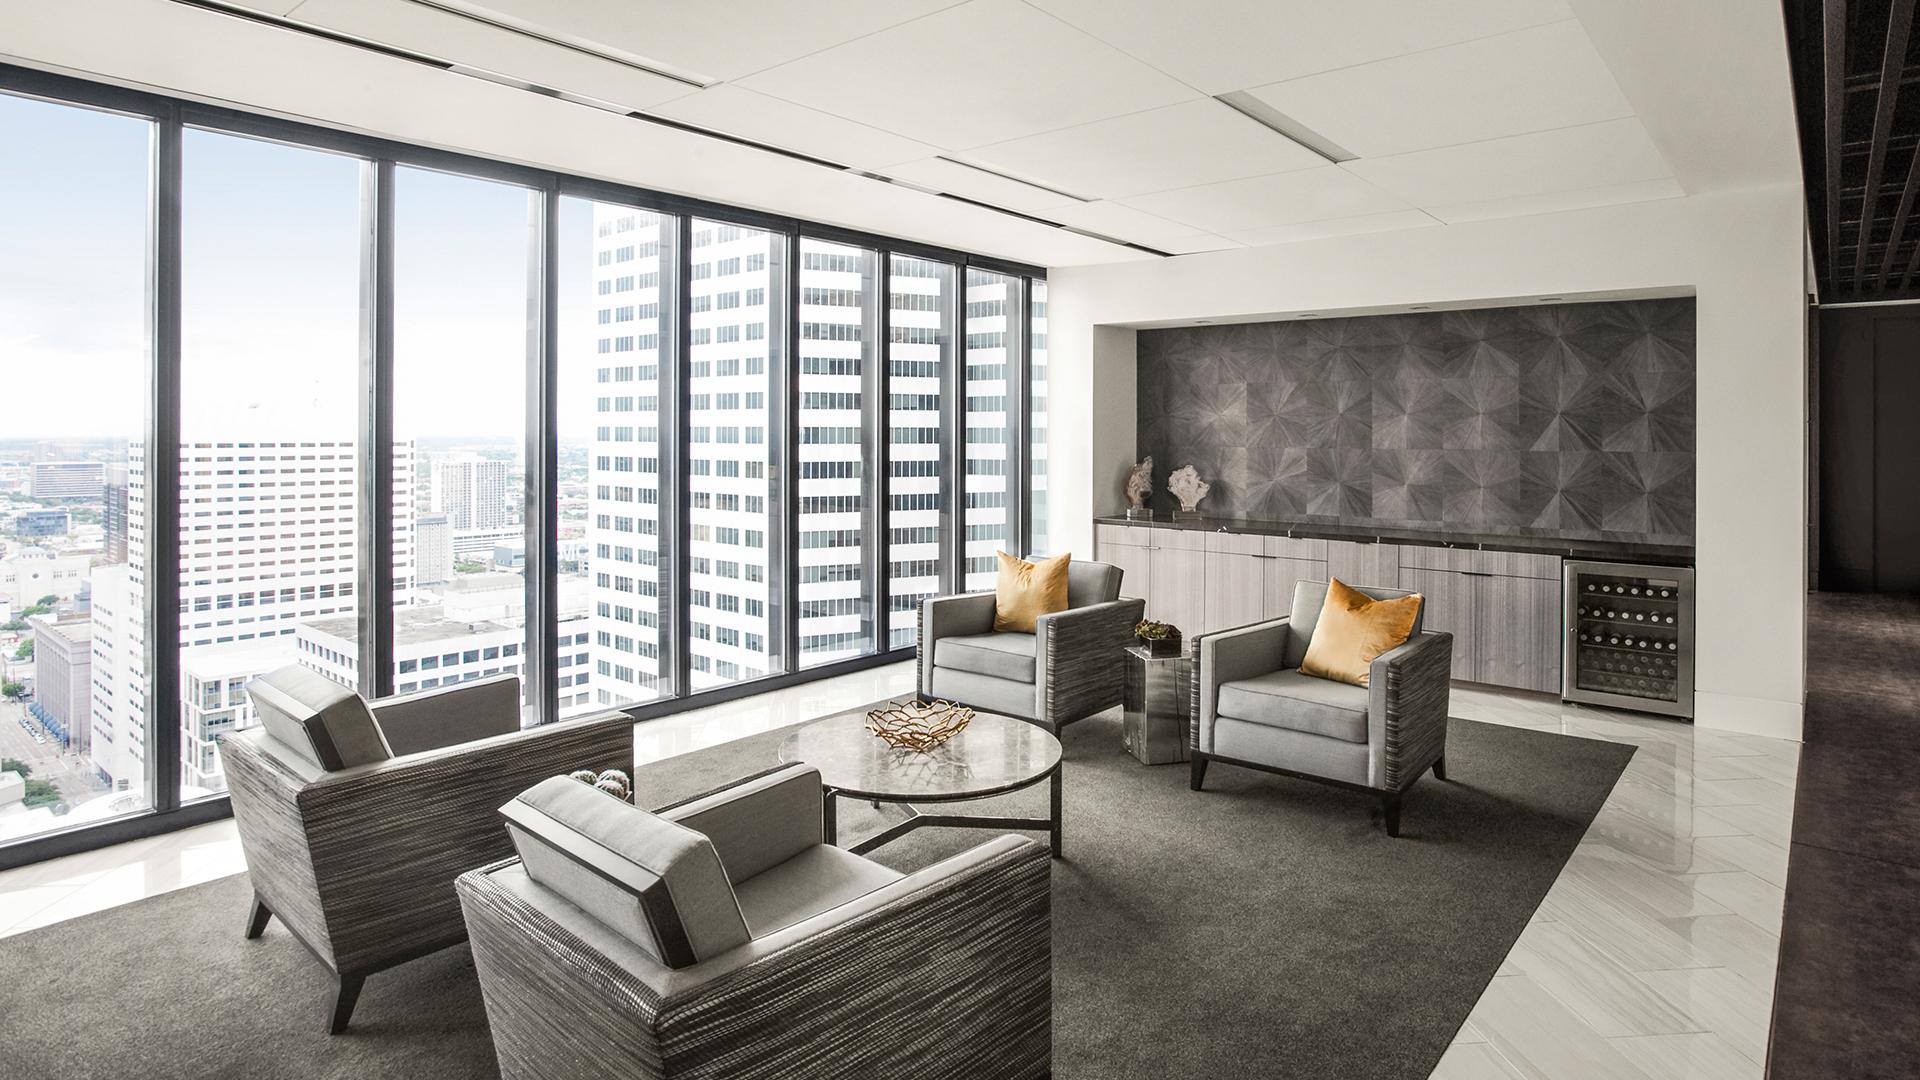 Corporate Law Interior Design Seating Coffee Bar